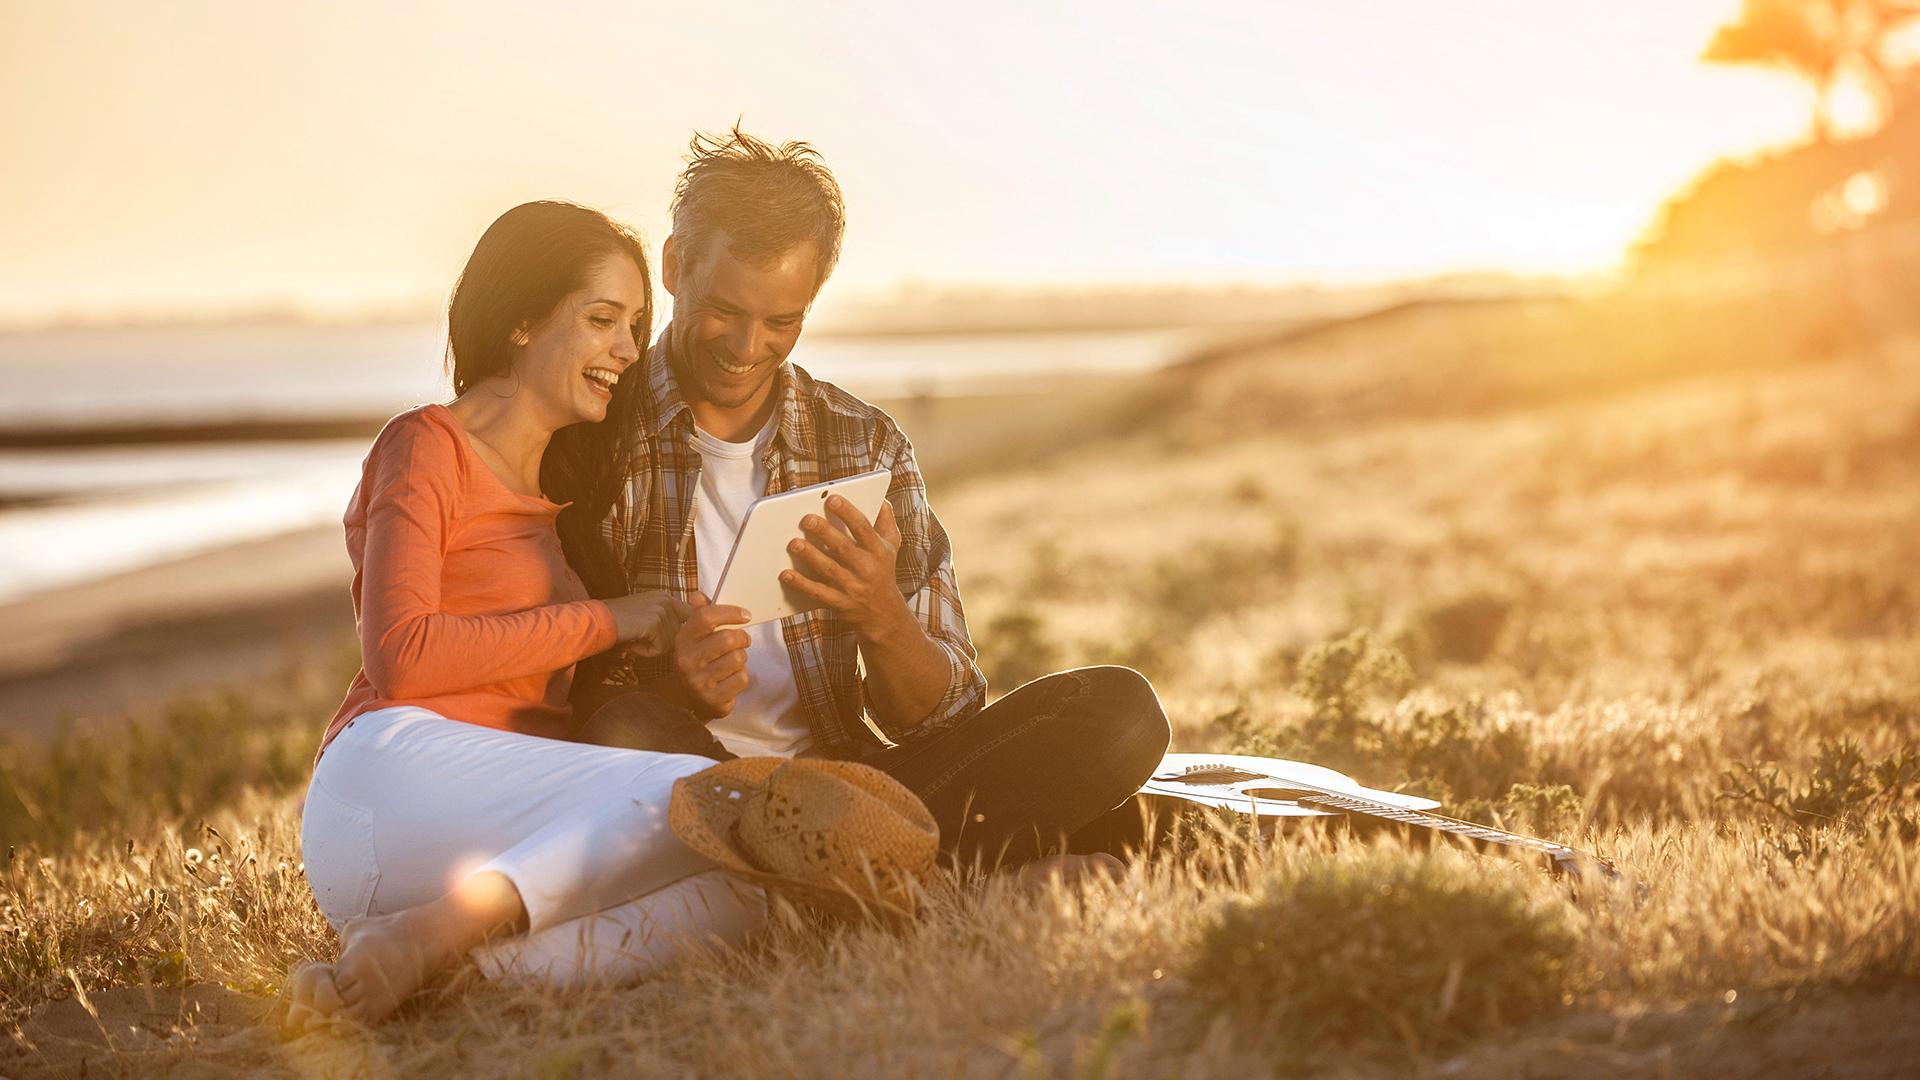 Dating After Divorce 15 Tips To Make It Easier